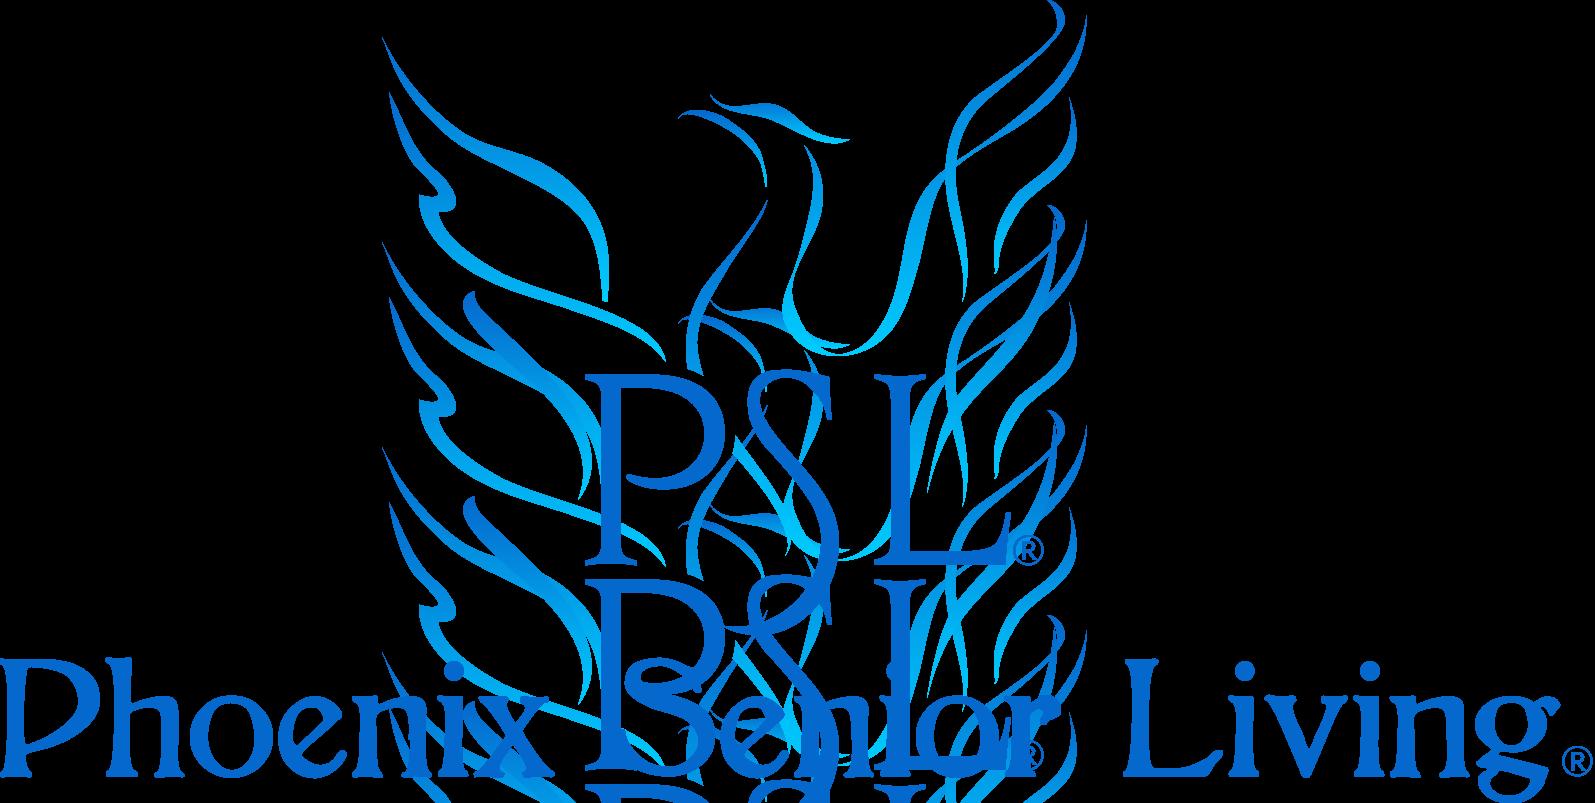 Phoenix Senior Living logo